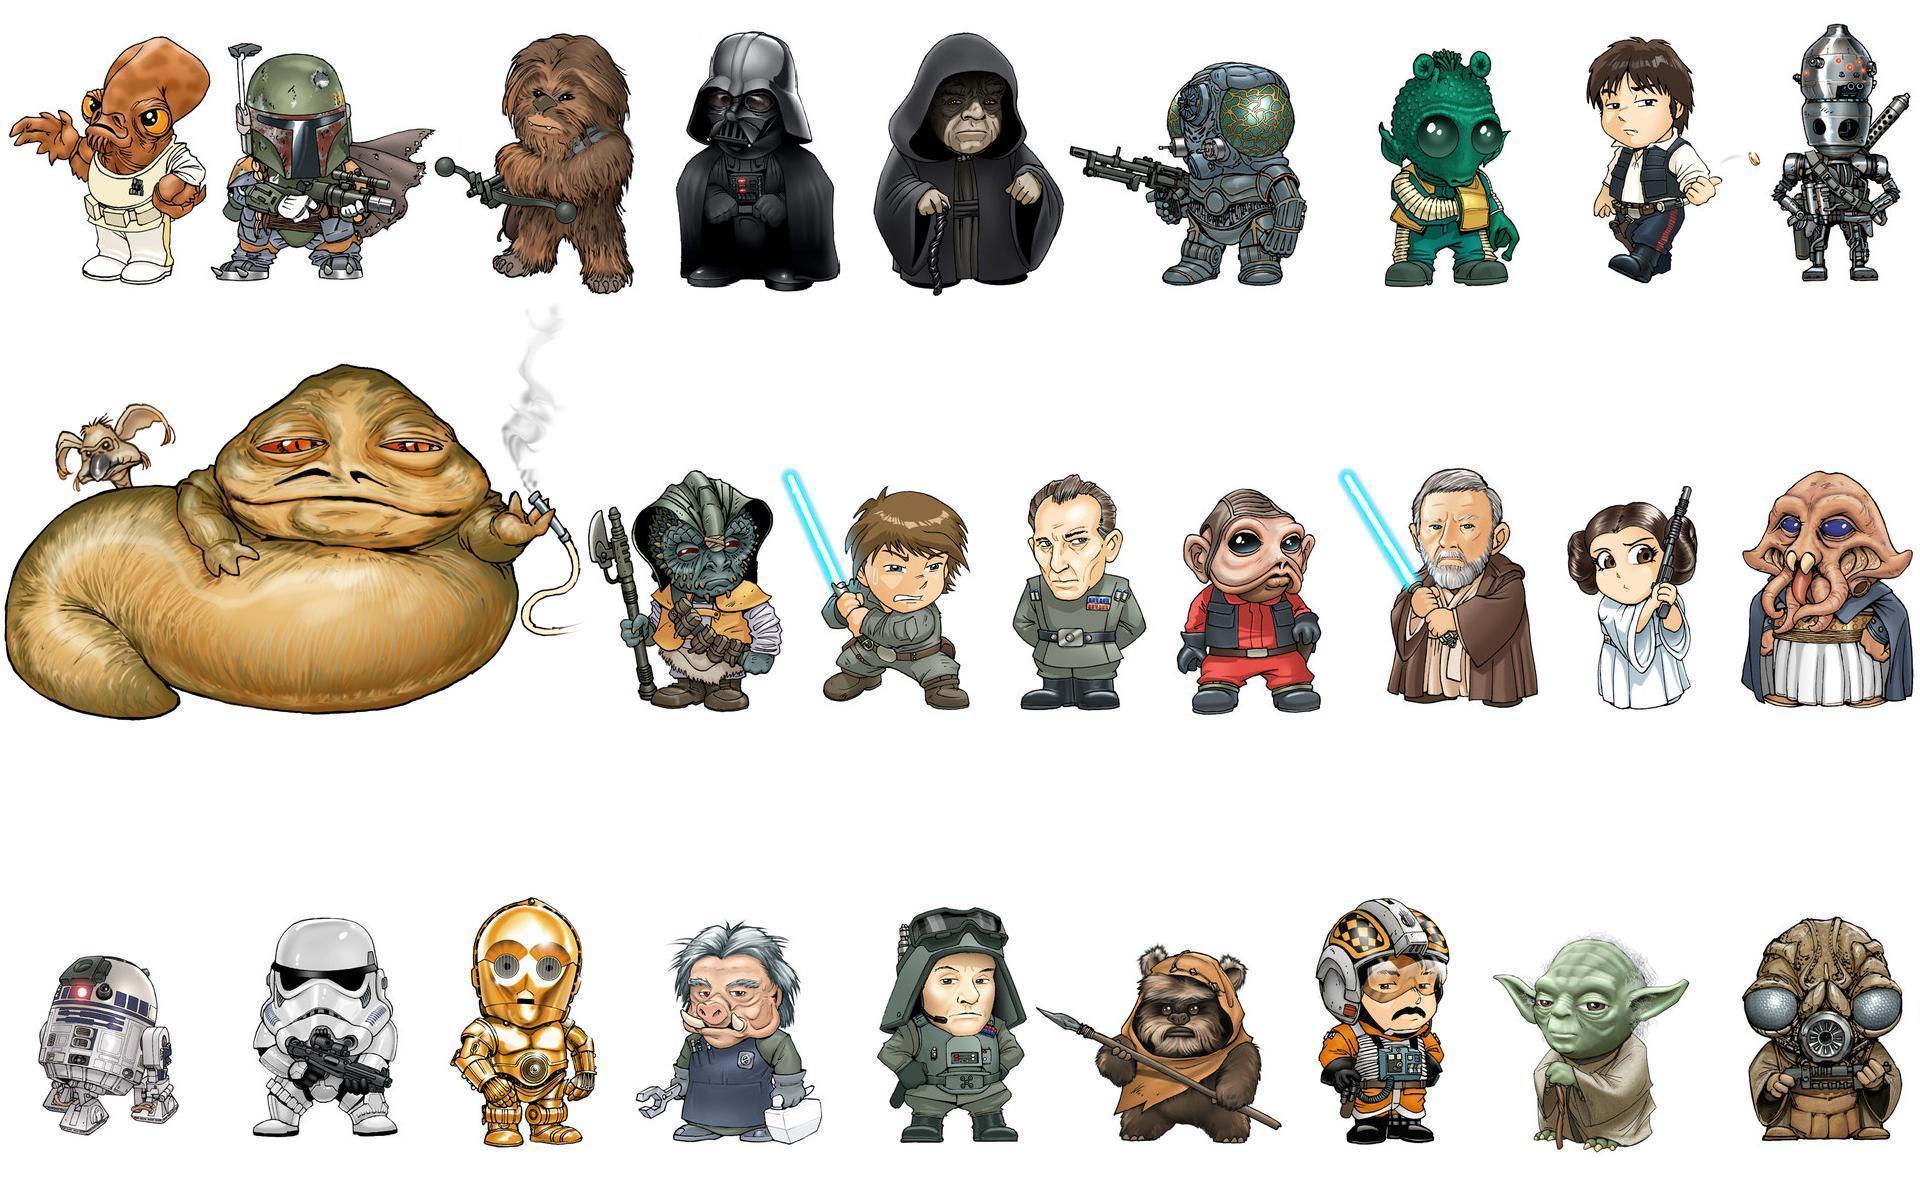 Star Wars Characters Hd Desktop Wallpaper Widescreen